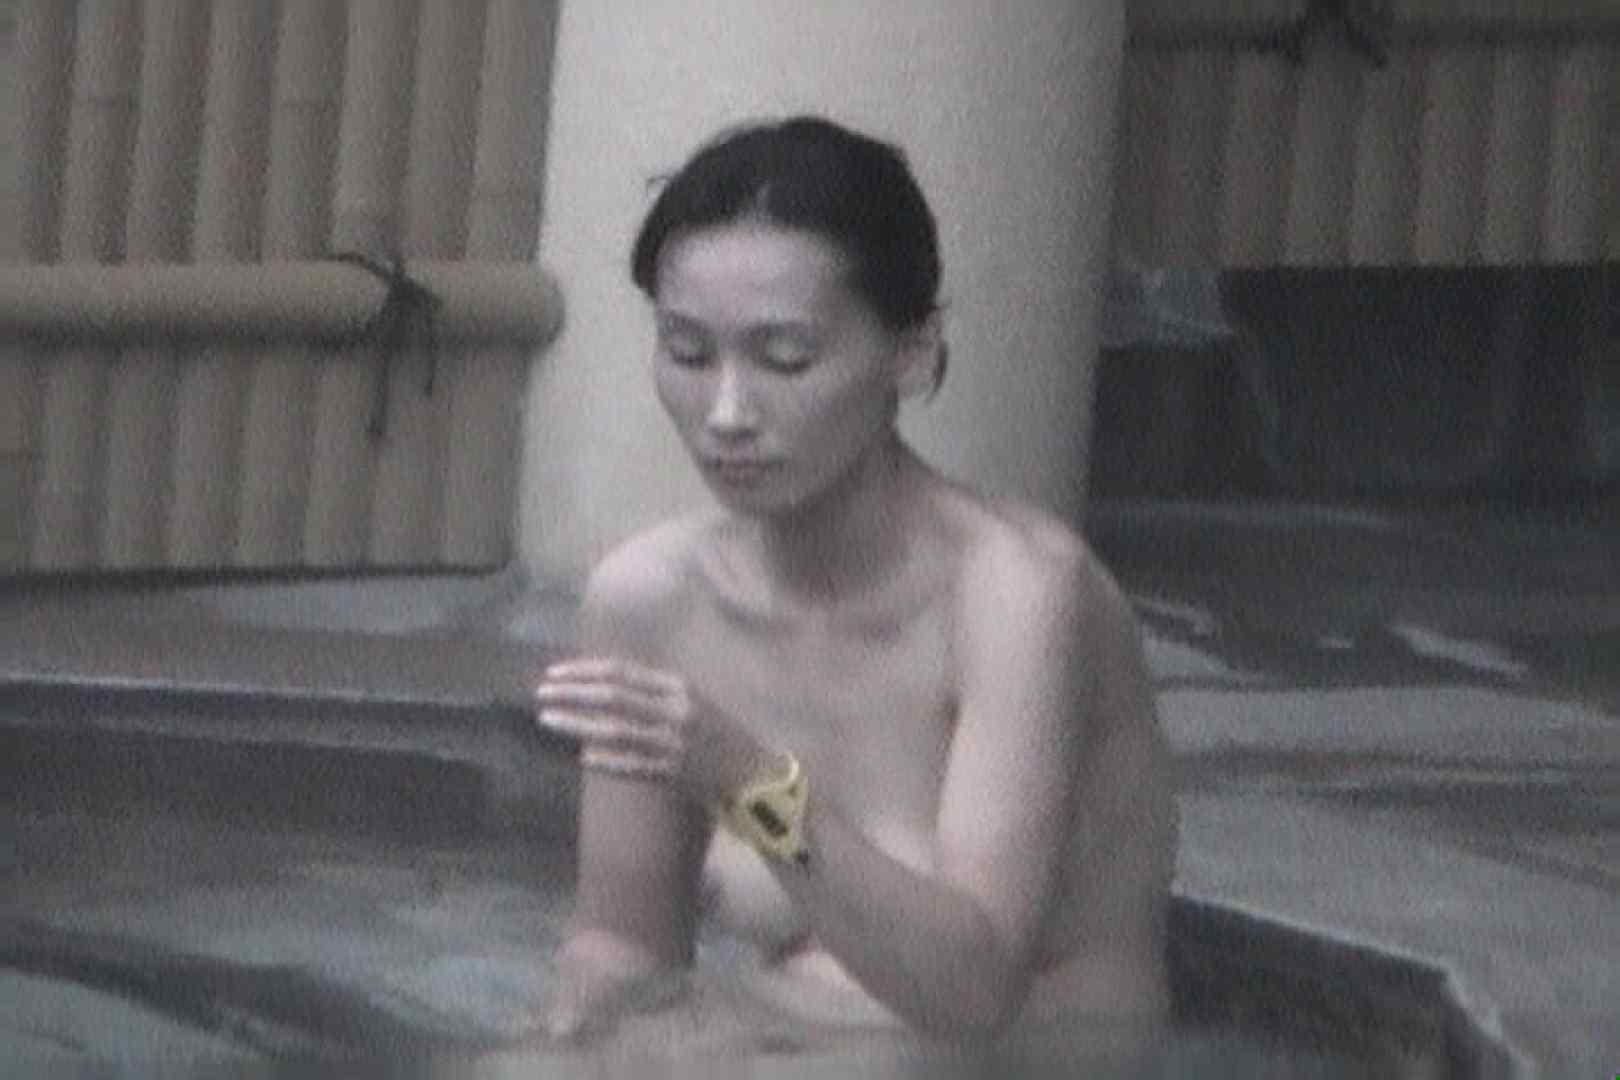 Aquaな露天風呂Vol.557 露天風呂編 | 盗撮シリーズ  100PIX 11